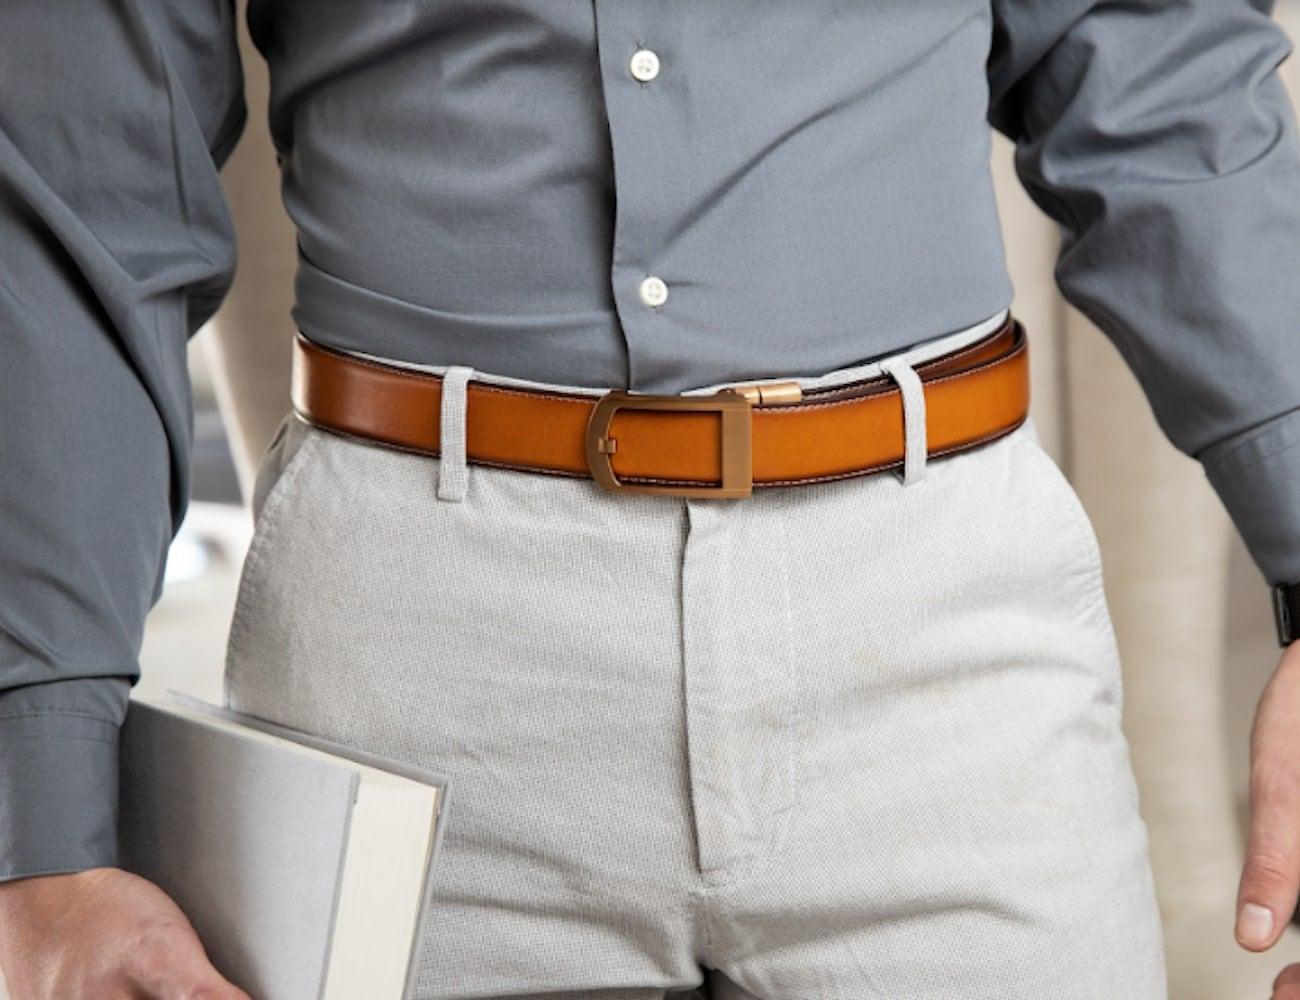 Craftmark Reversible Leather Belt